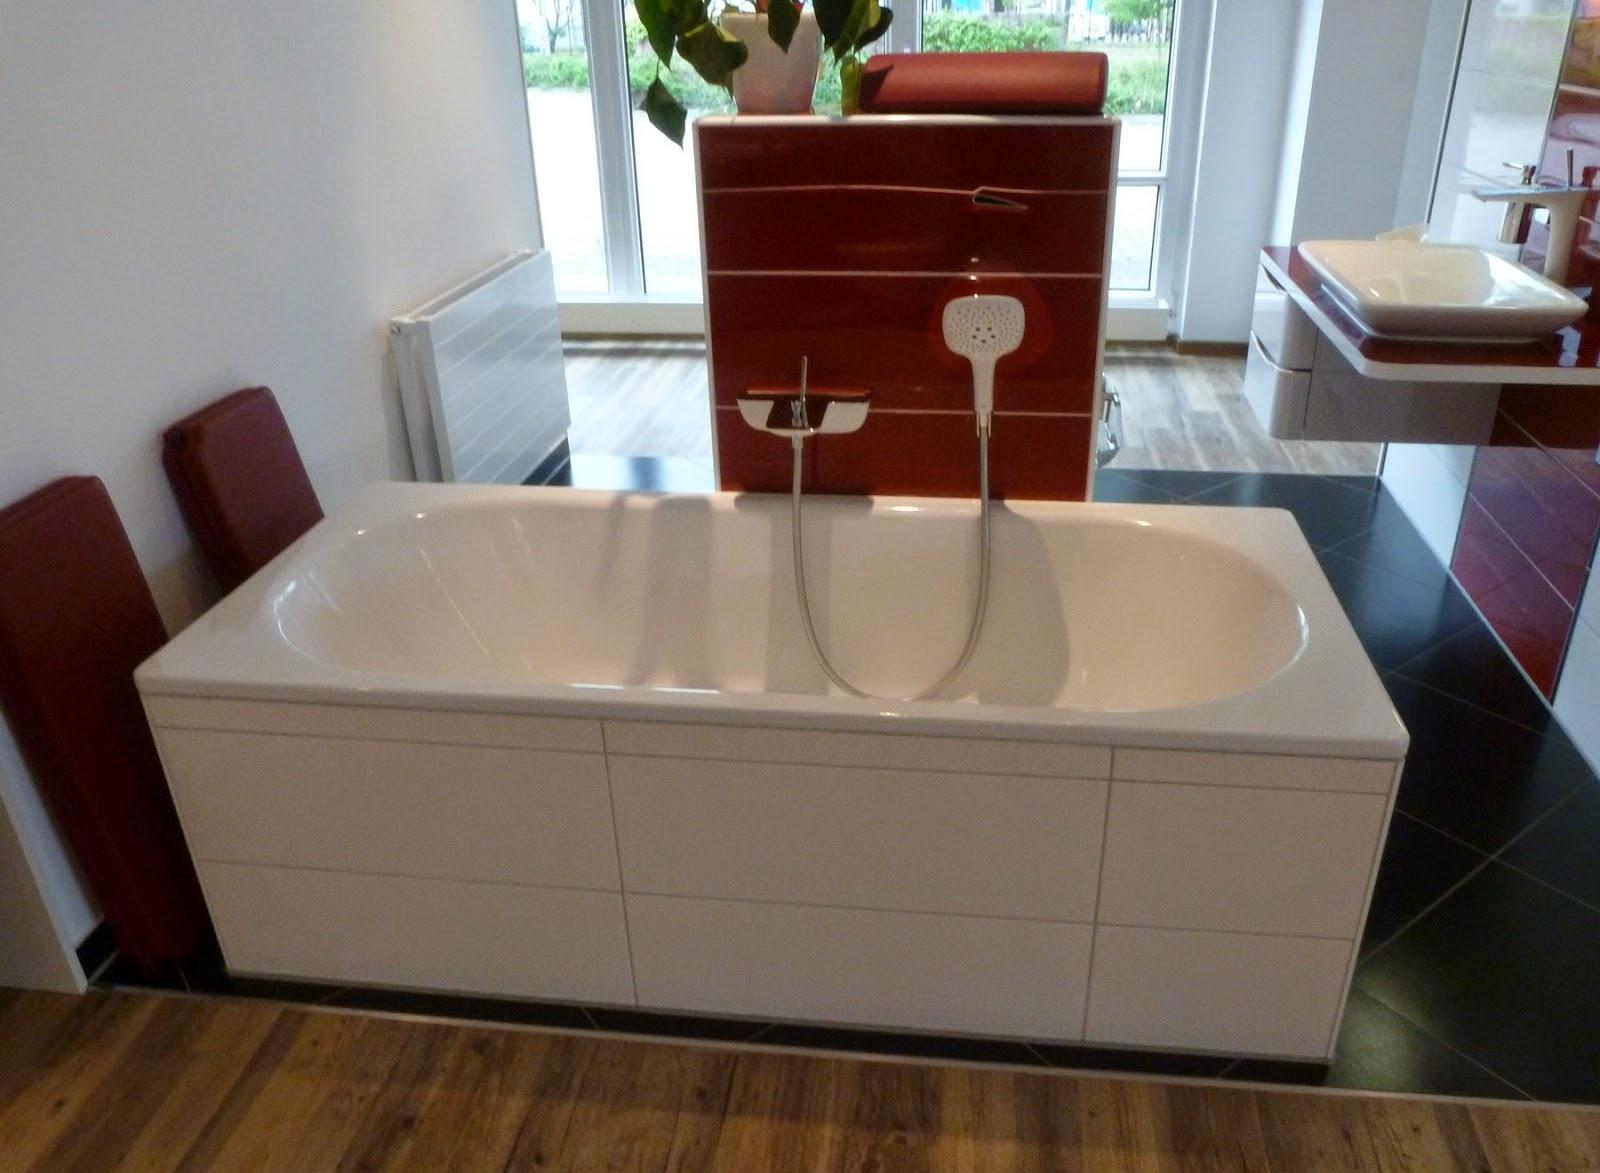 m m bauen august 2014. Black Bedroom Furniture Sets. Home Design Ideas